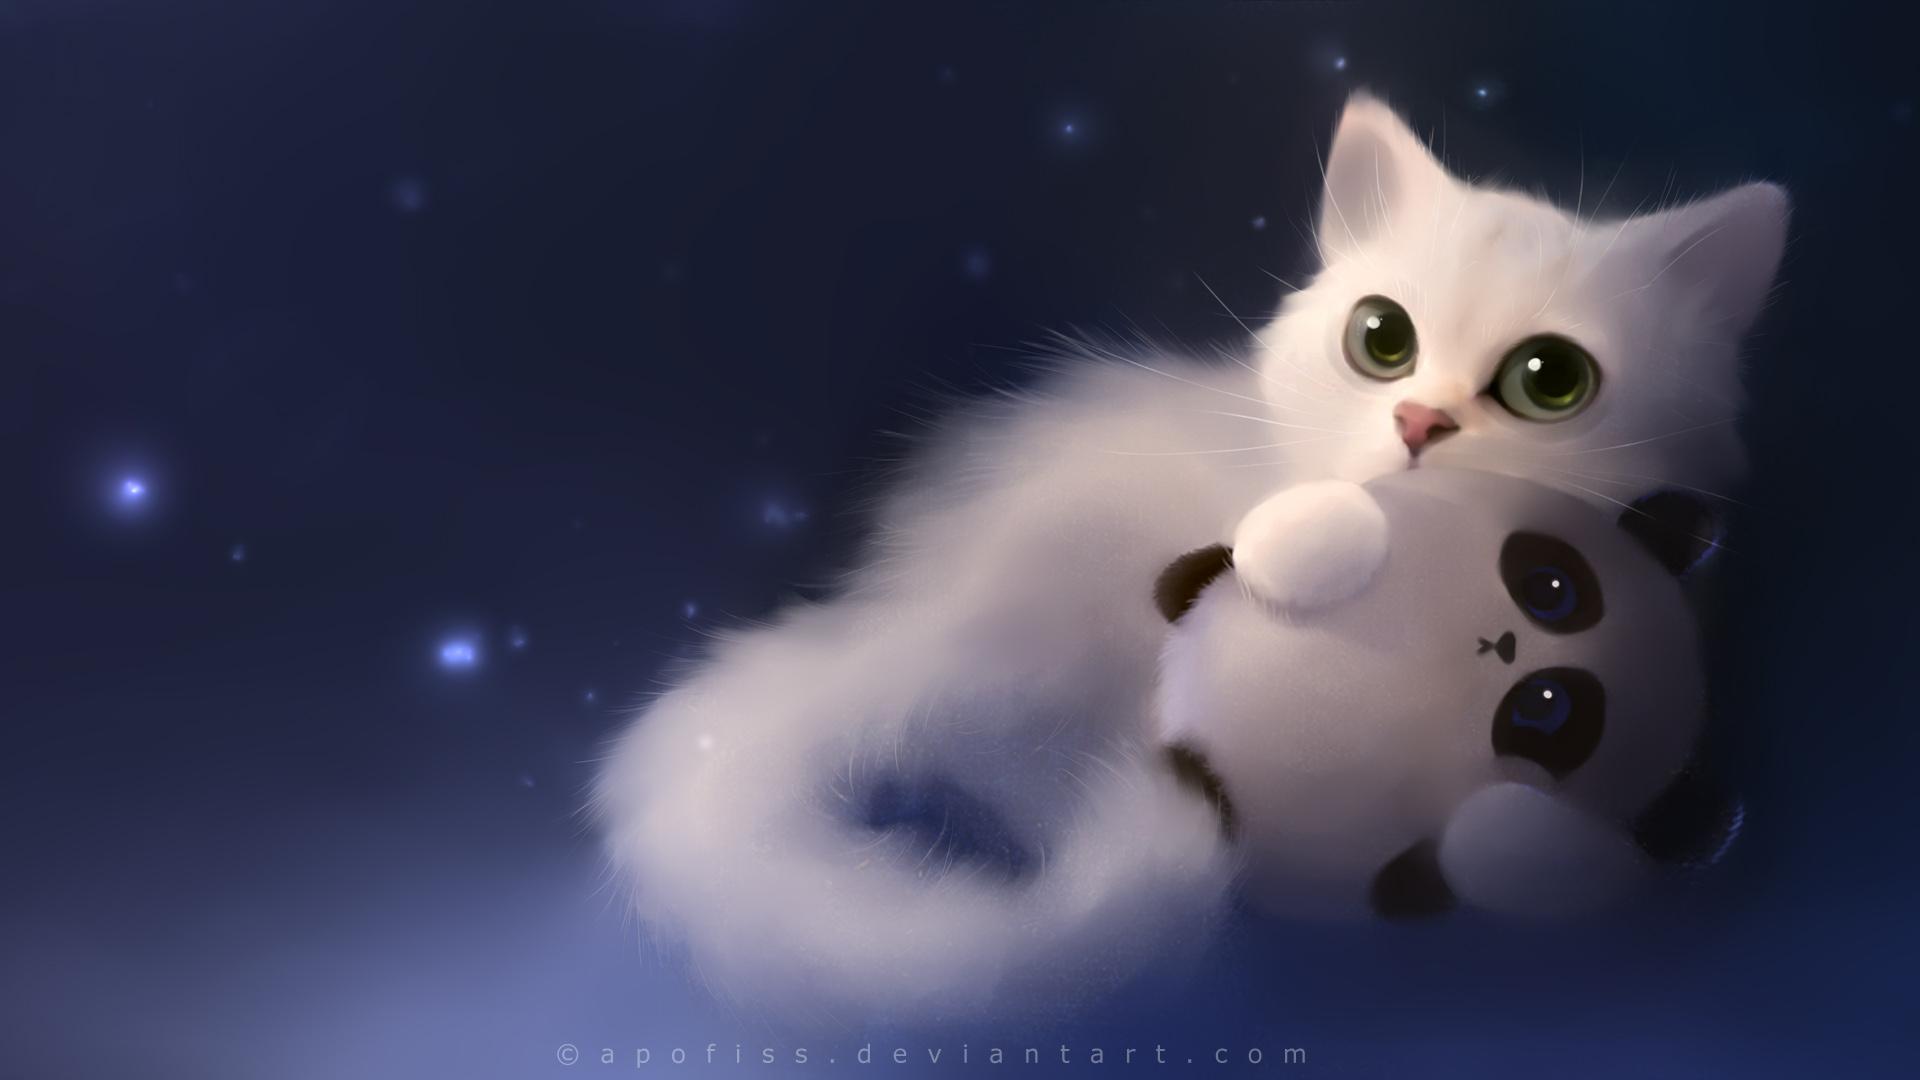 Tags Anime Apofiss White Cat Stuffed Panda DeviantART HD Wallpaper